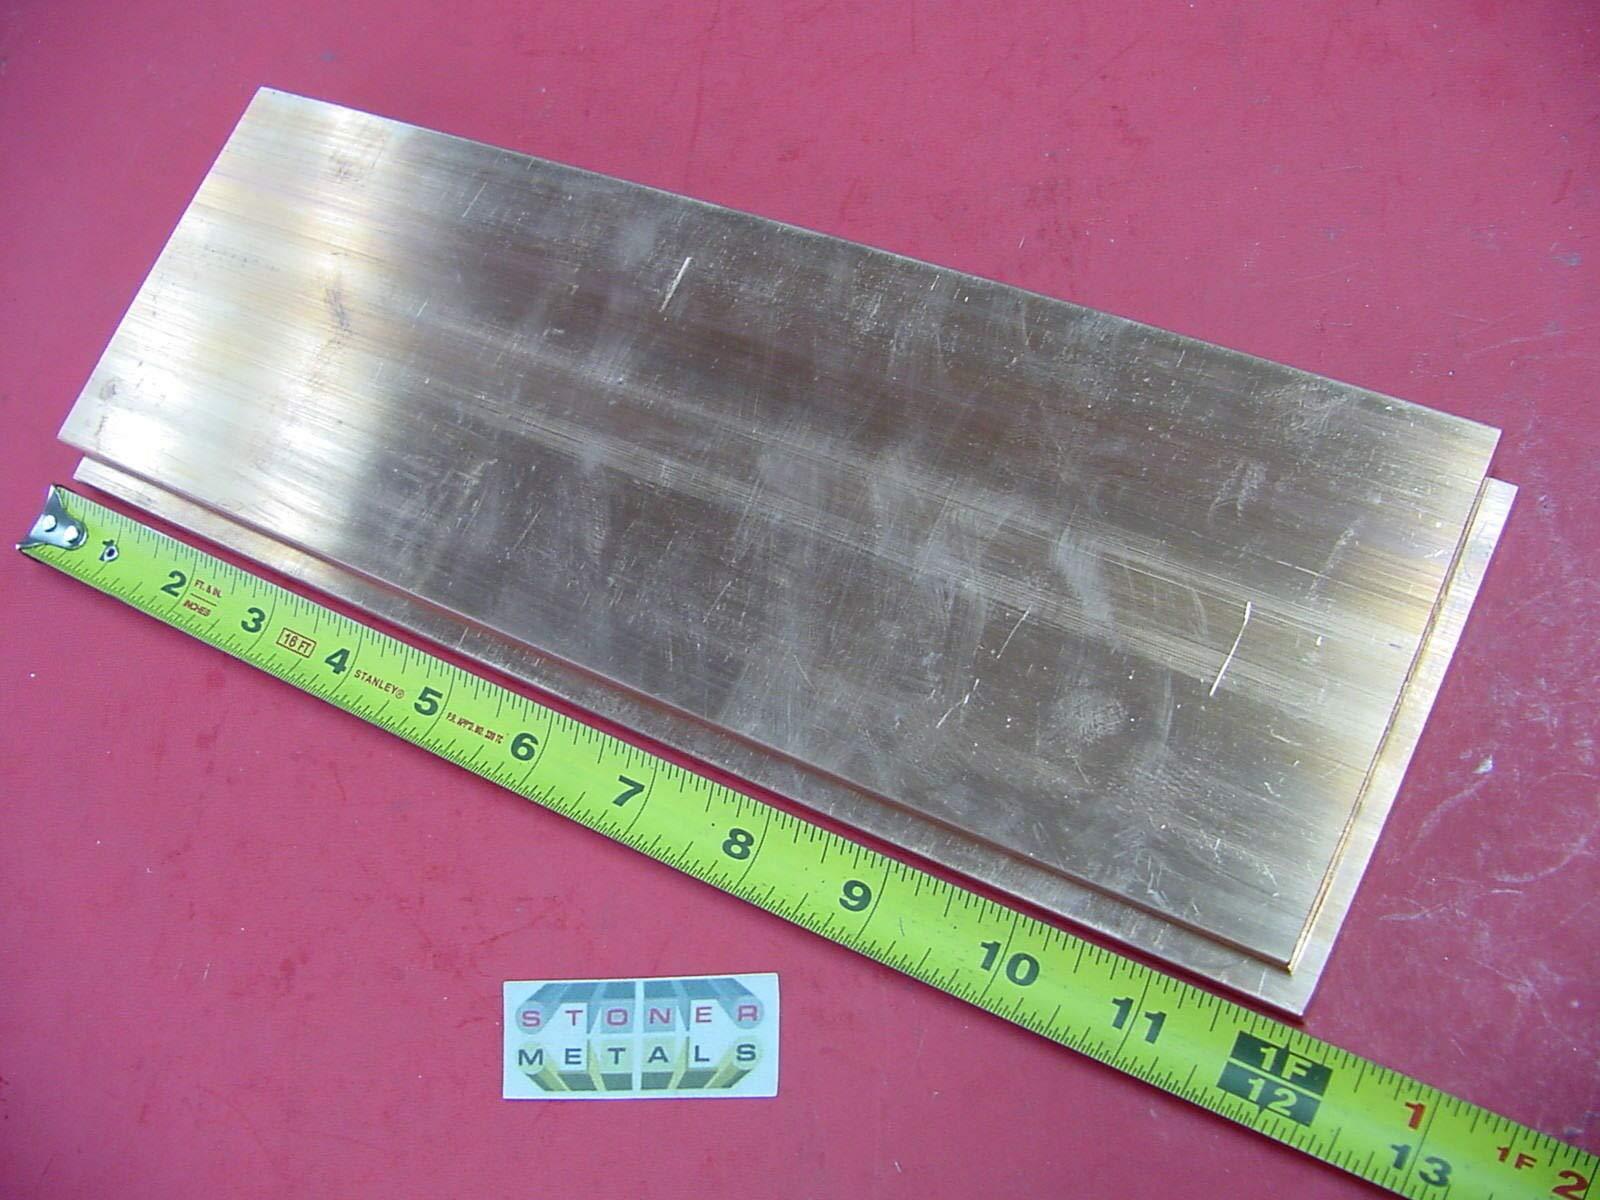 2 Pieces 1/4''x 4'' C110 COPPER BAR 12'' long Solid Flat Bar .25x 4 Bus Bar Stock by Tan Home